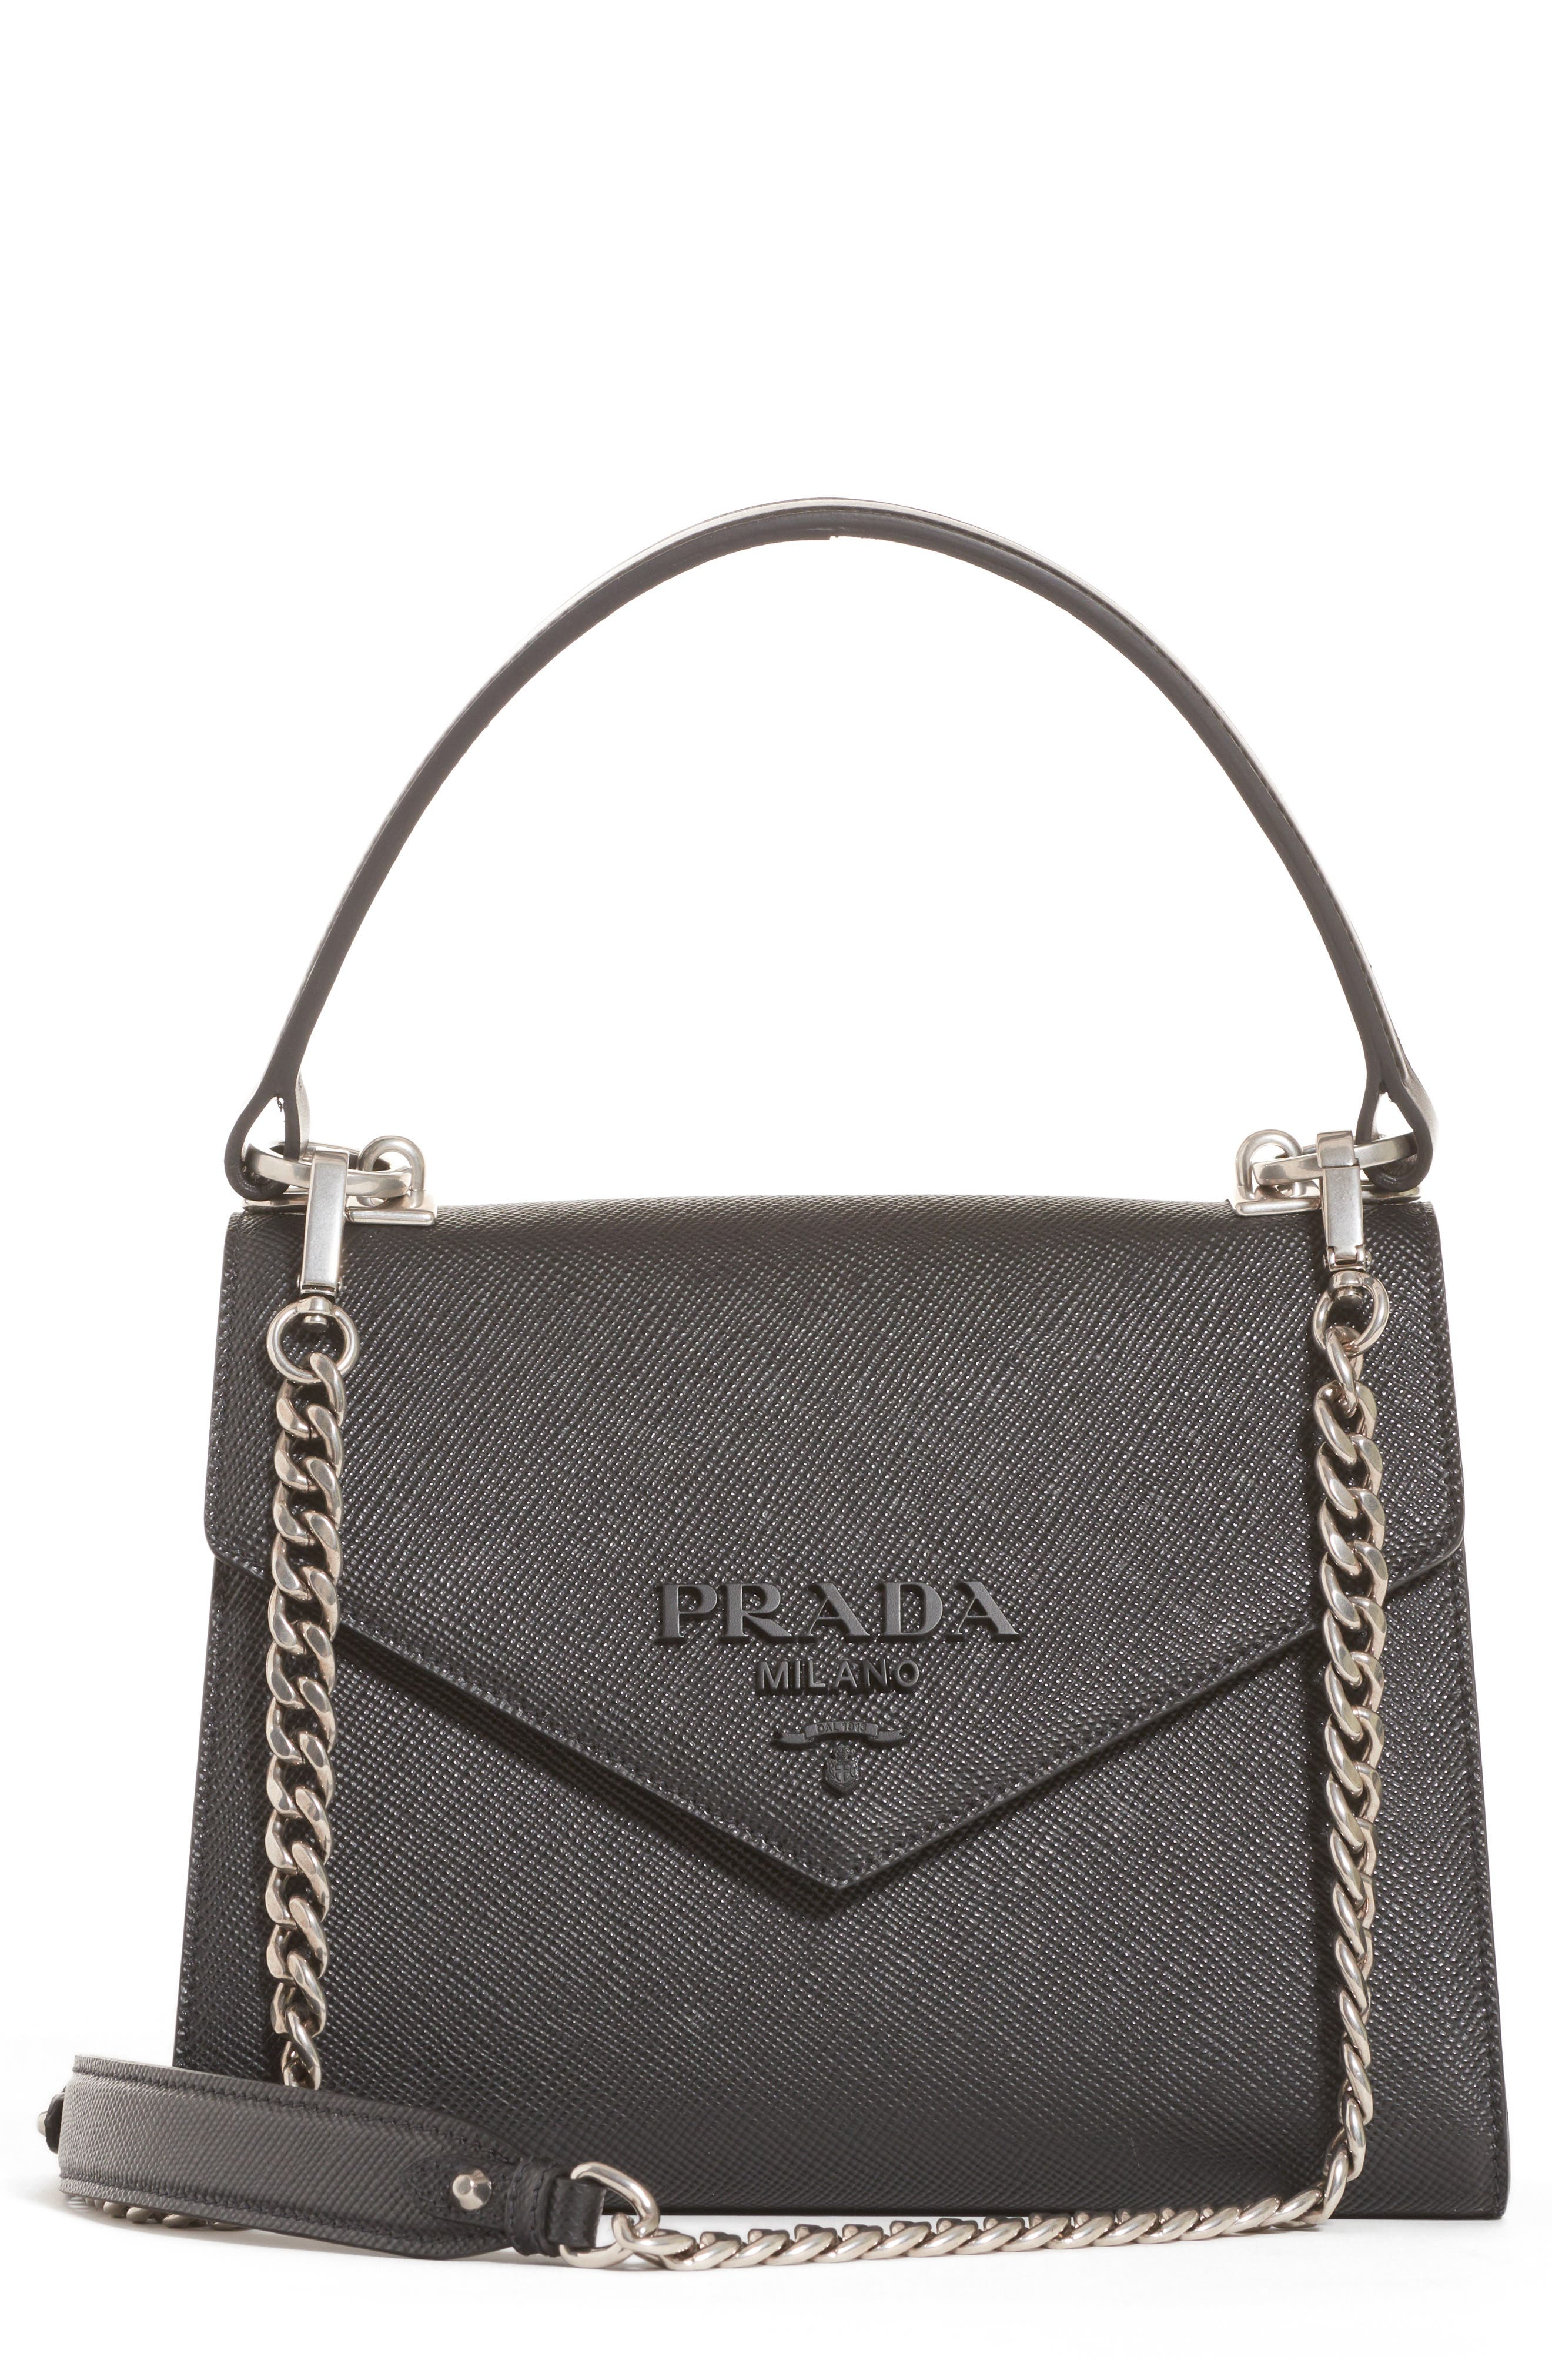 Prada Monochrome Logo Top Handle Leather Handbag